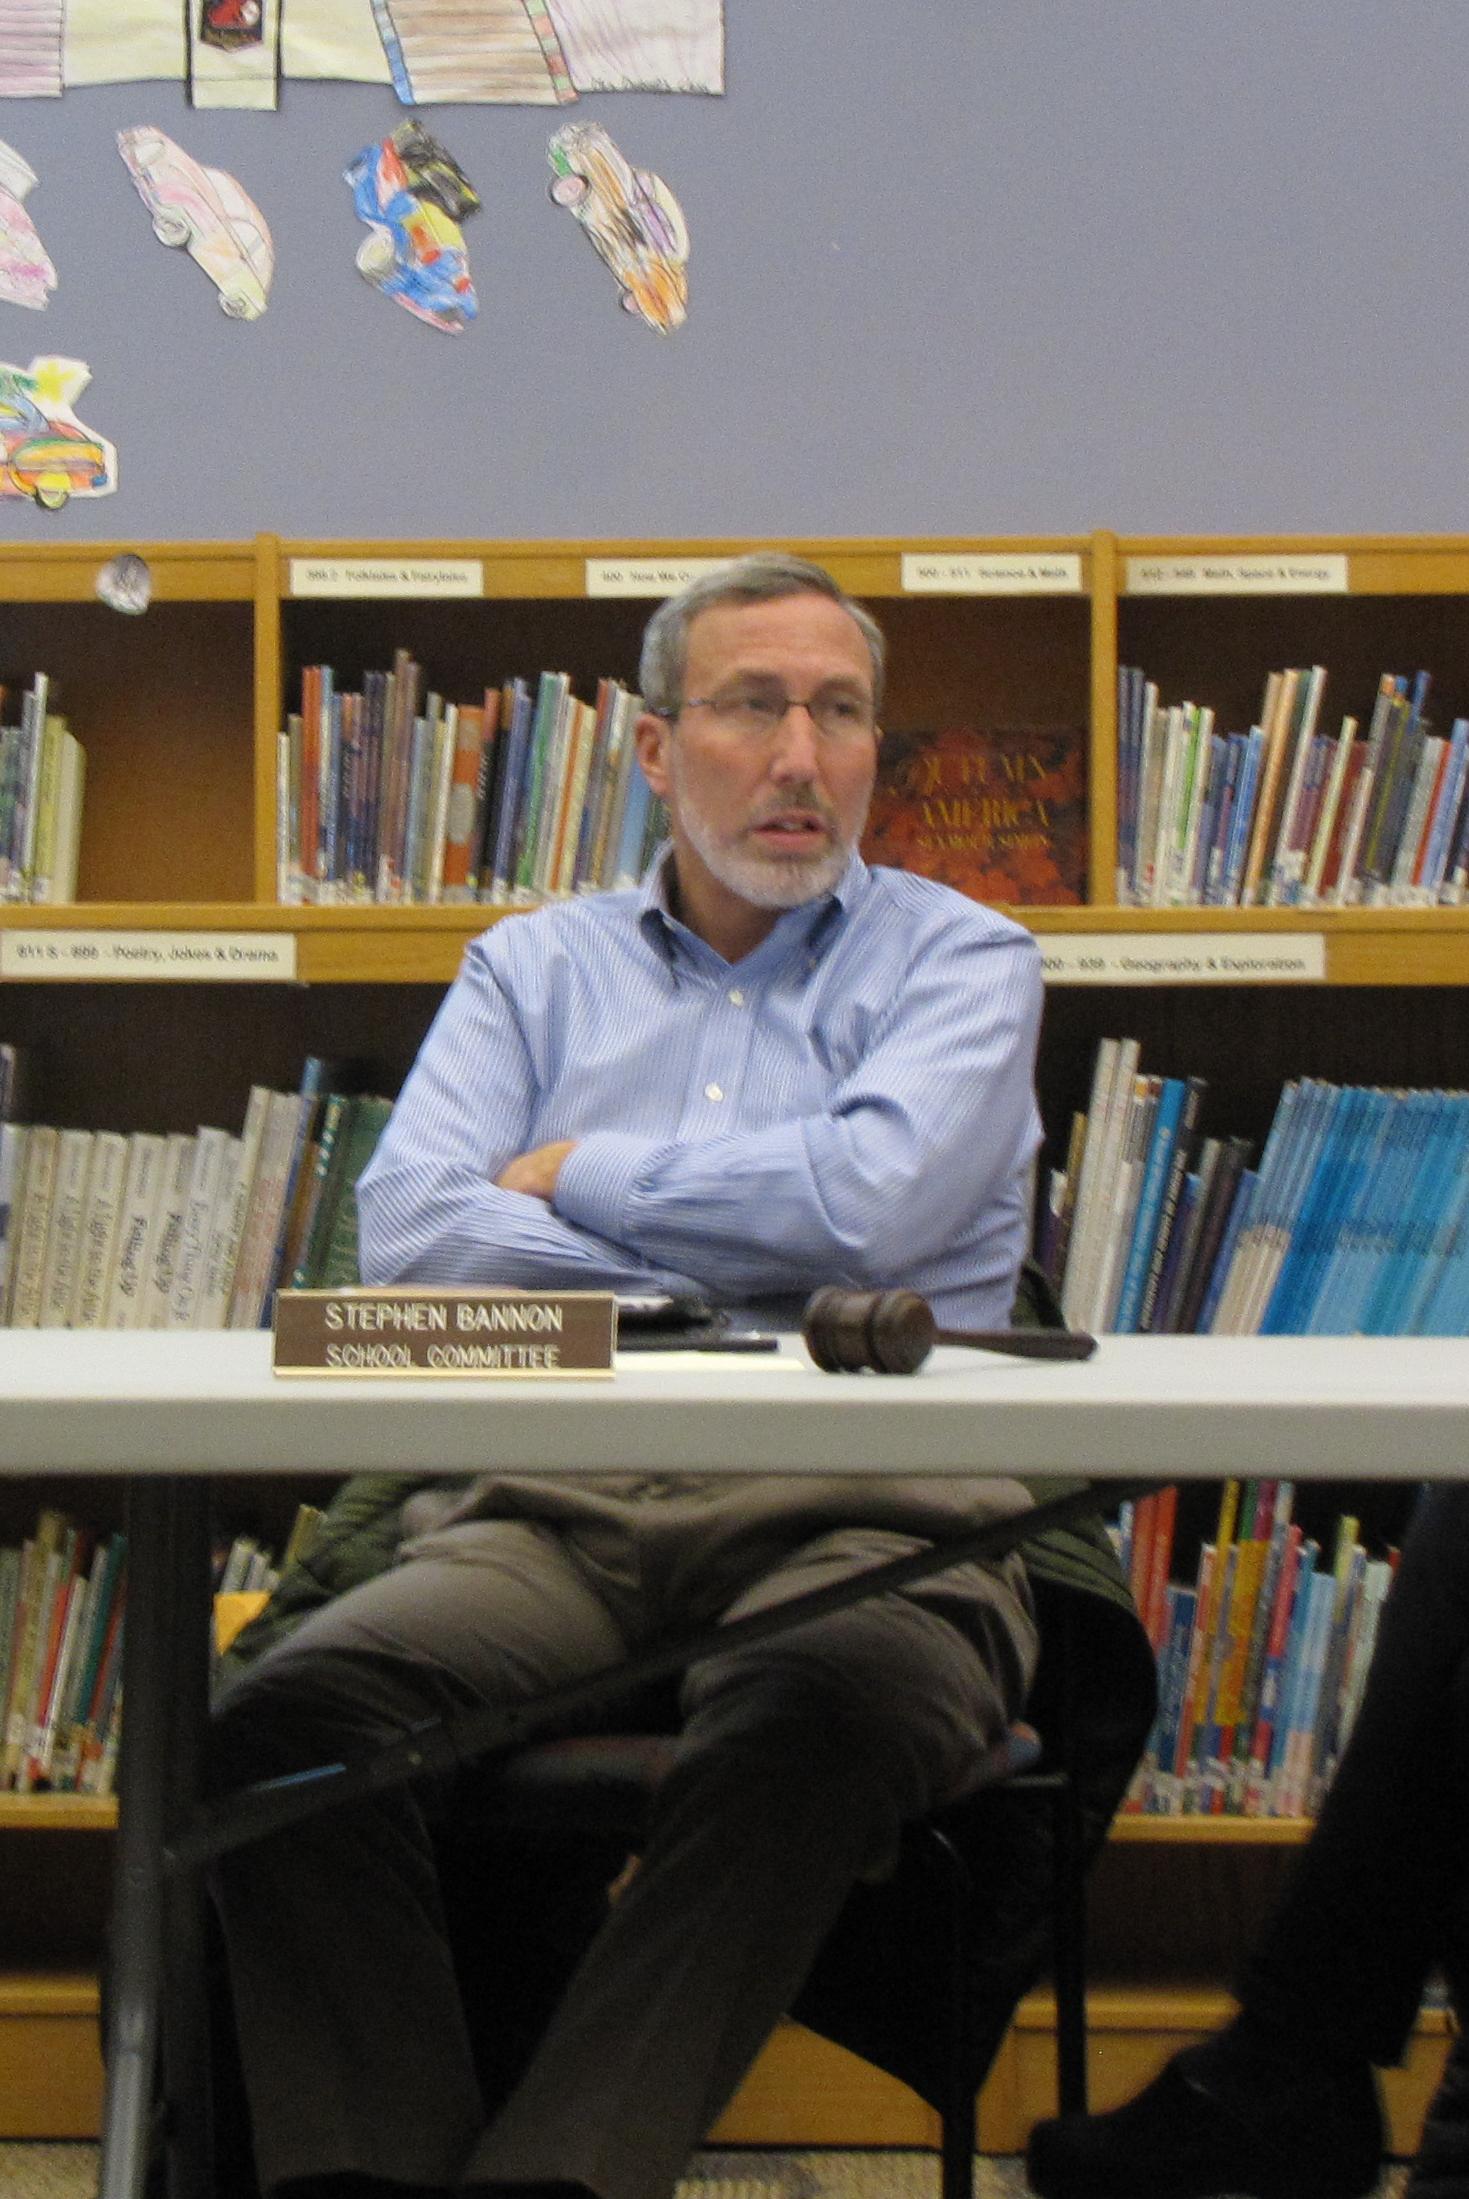 Berkshire Hills School Committee Chairman Stephen Bannon.